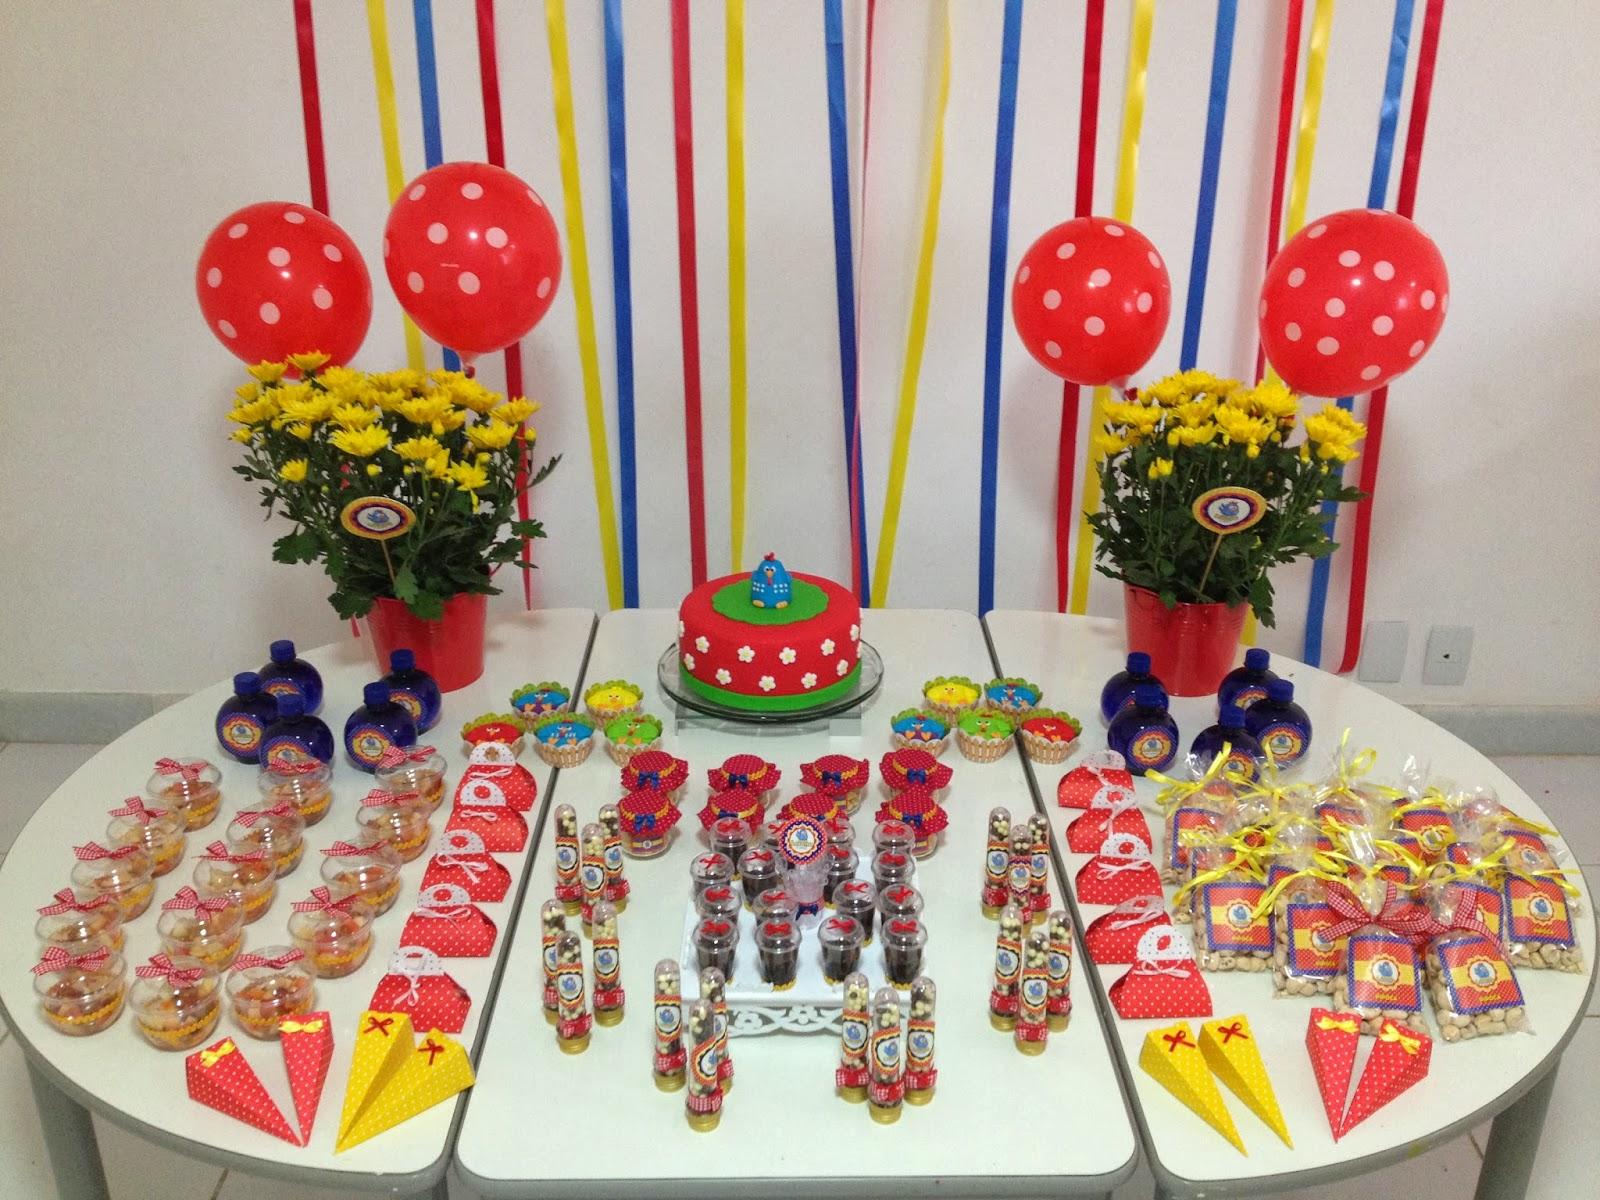 decoracao festa infantil kick buttowski : decoracao festa infantil kick buttowski:Quero Cupcakes: Galinha Pintadinha Festa na escola